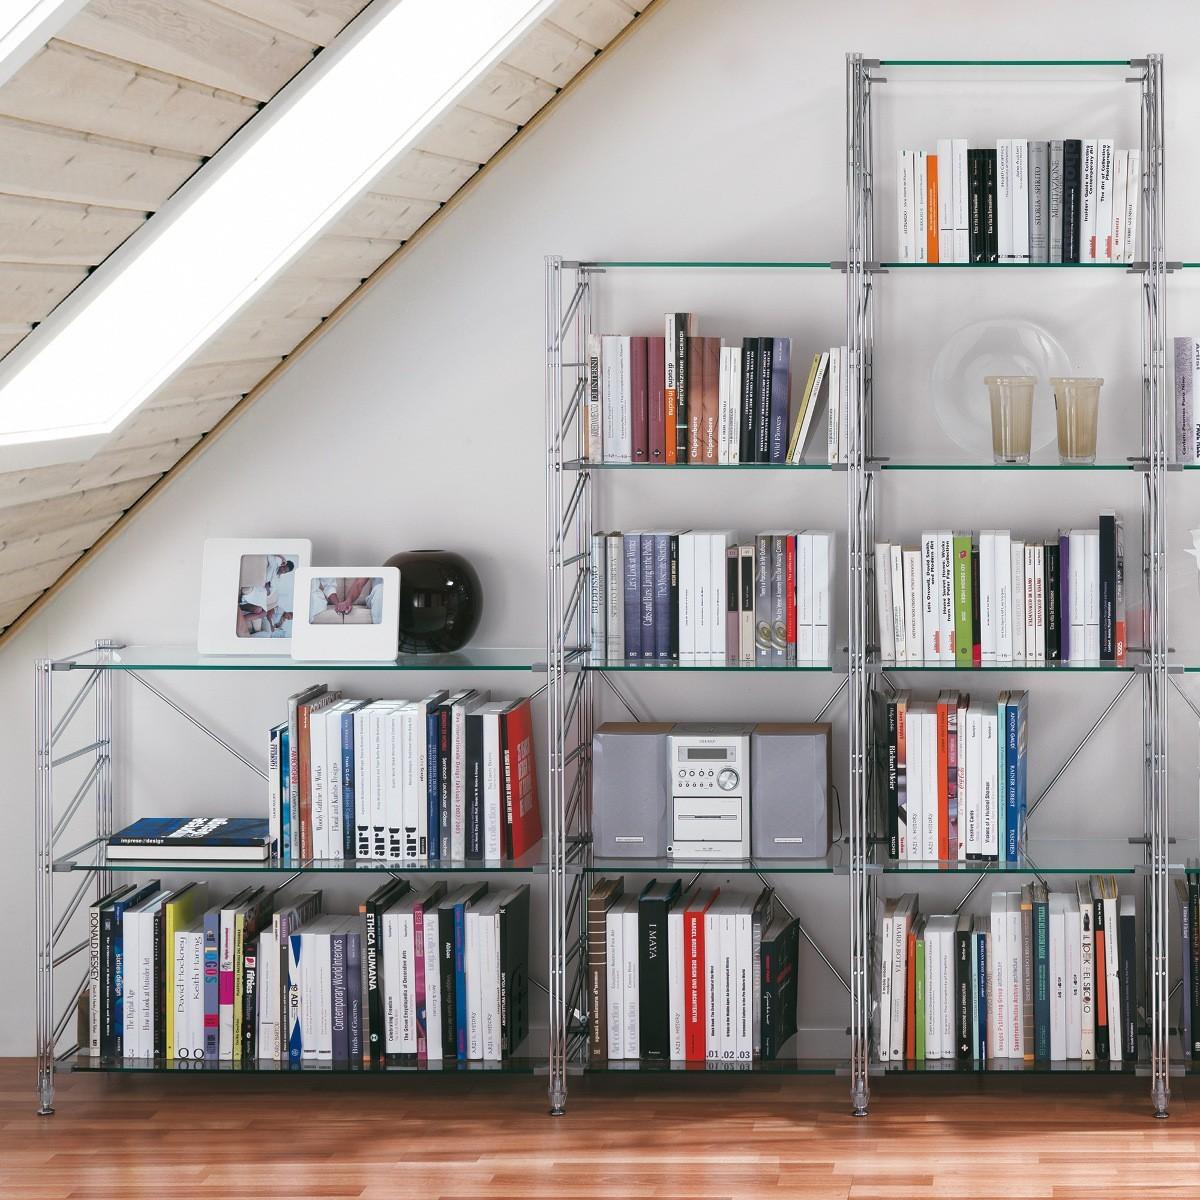 Librerie Componibili Per Mansarda.Libreria Per Mansarda In Acciaio E Vetro Design Moderno Socrate 43